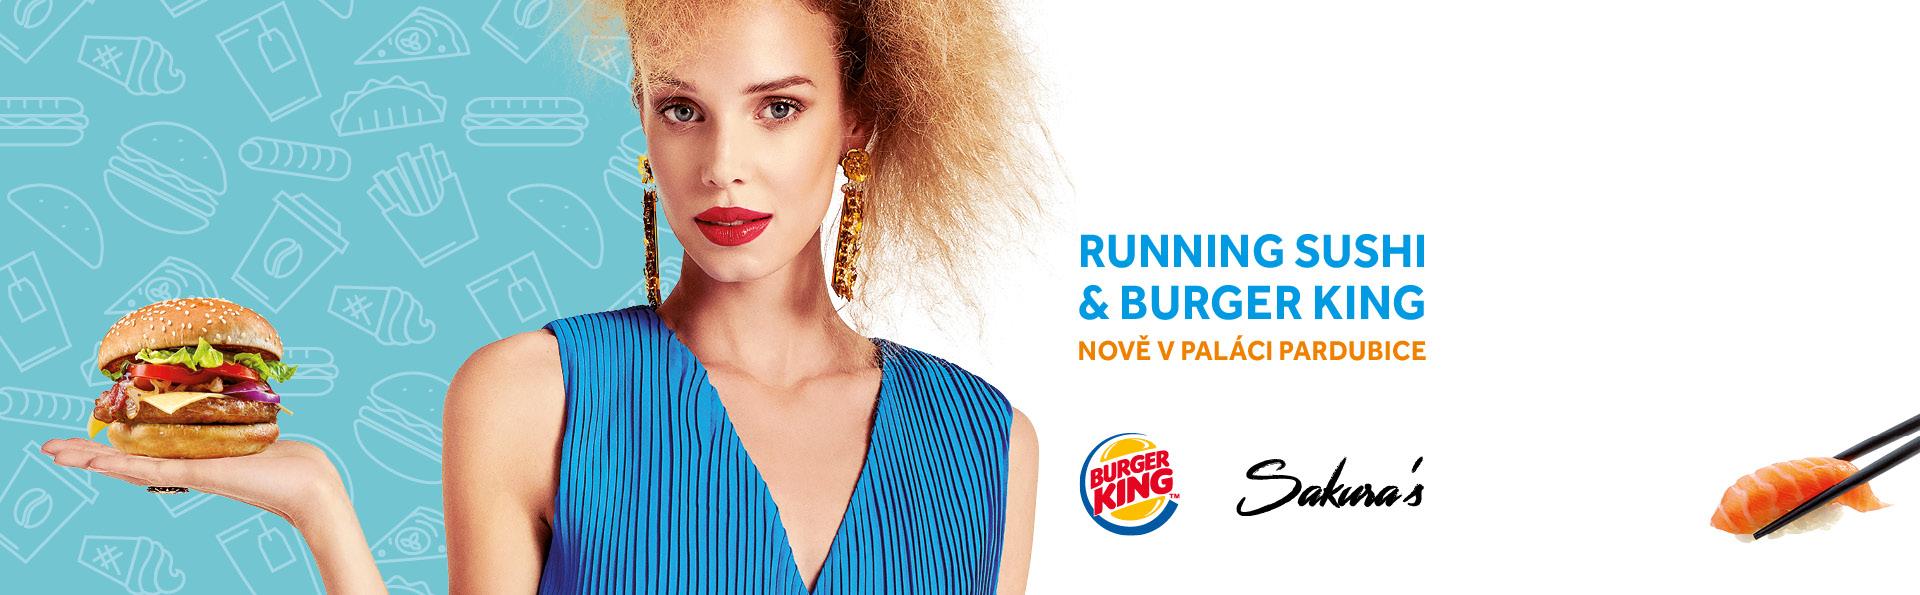 Running Sushi a Burger King nově v PALÁCI Pardubice